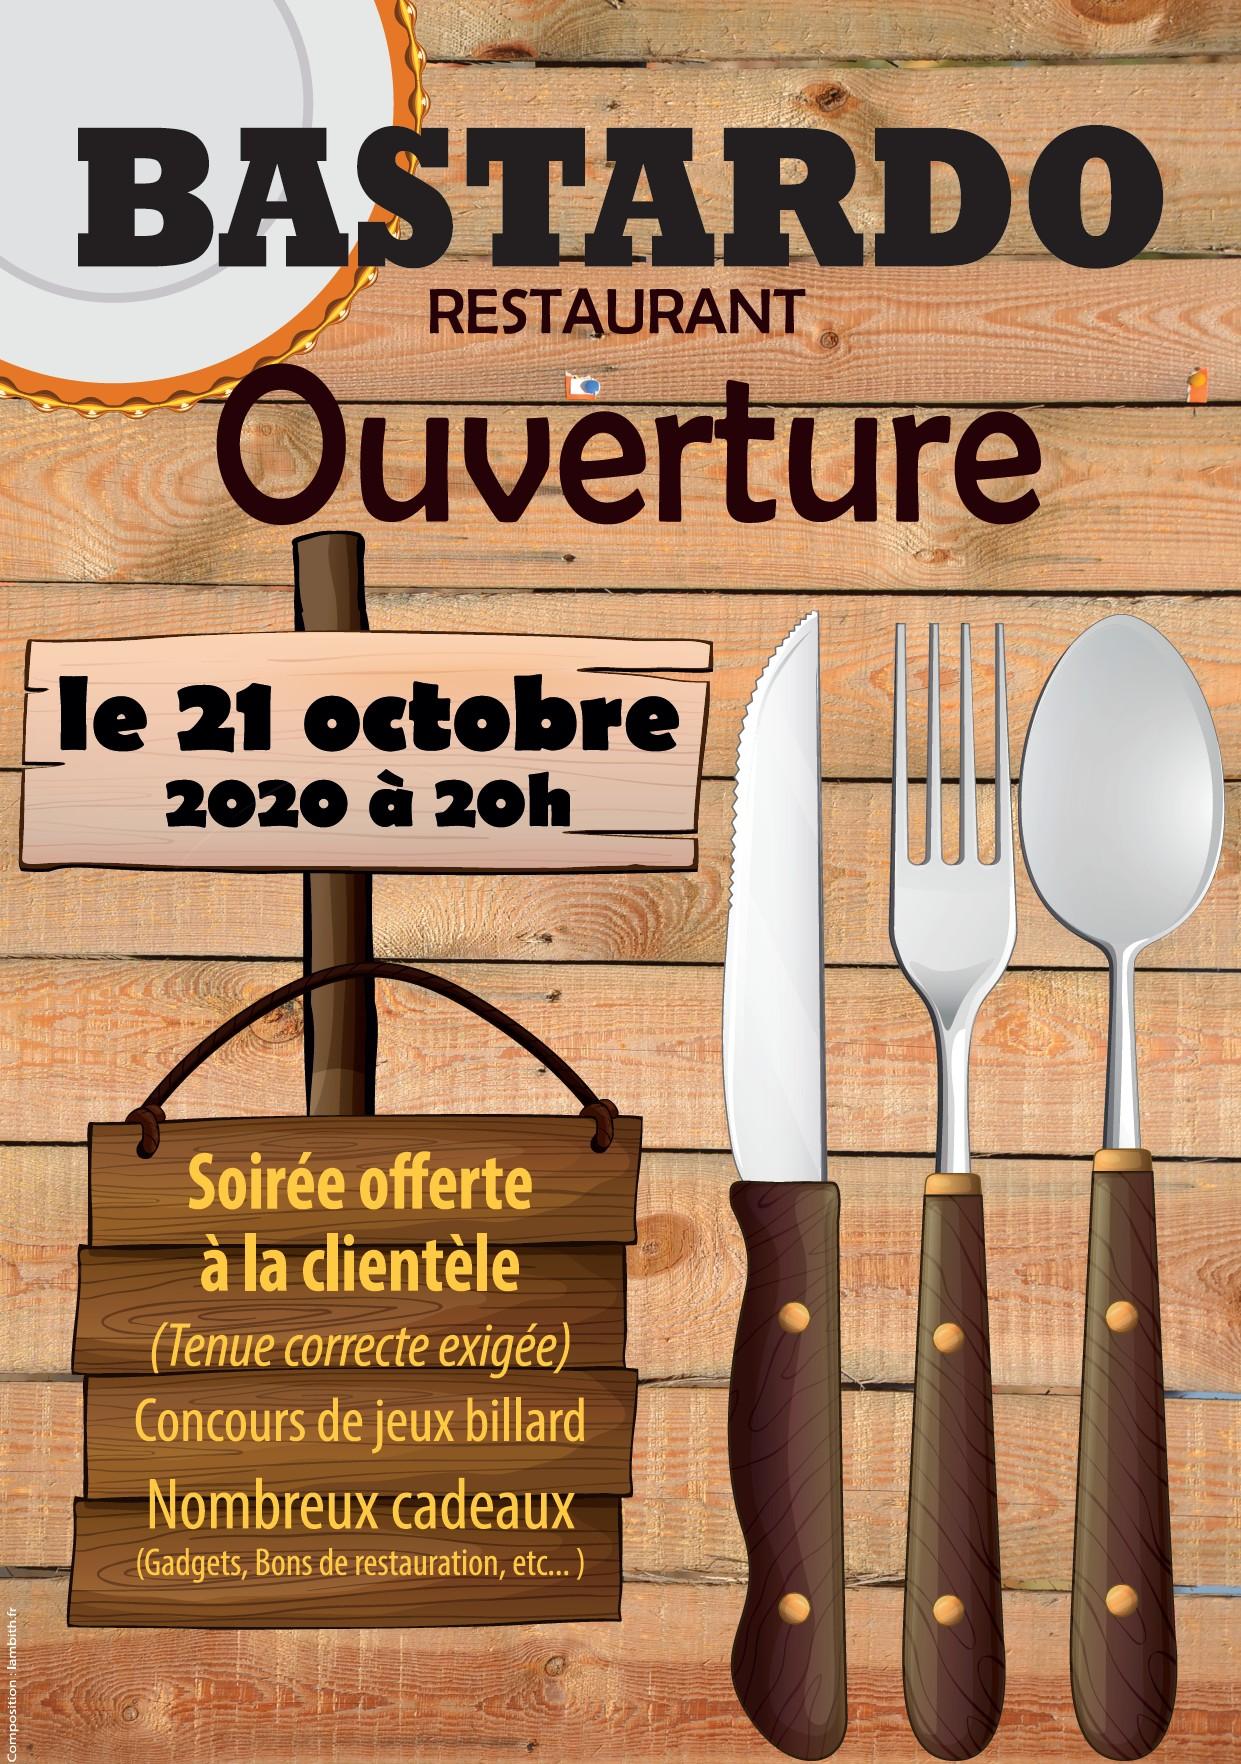 Restaurant Bastardo de Strasbourg